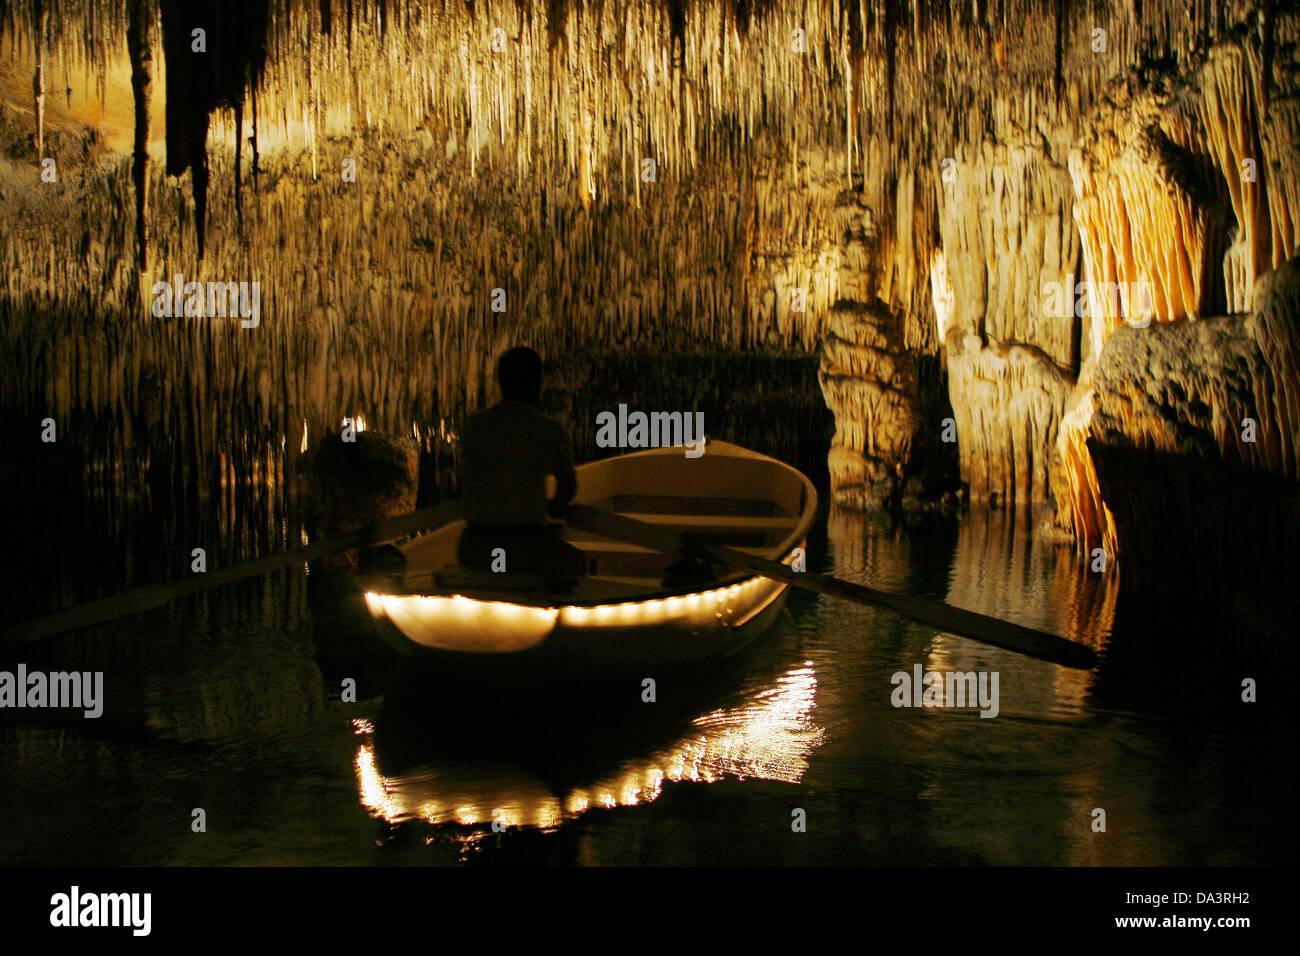 Inside The Cuevas Del Drach Caves In Spanish Island Of Mallorca